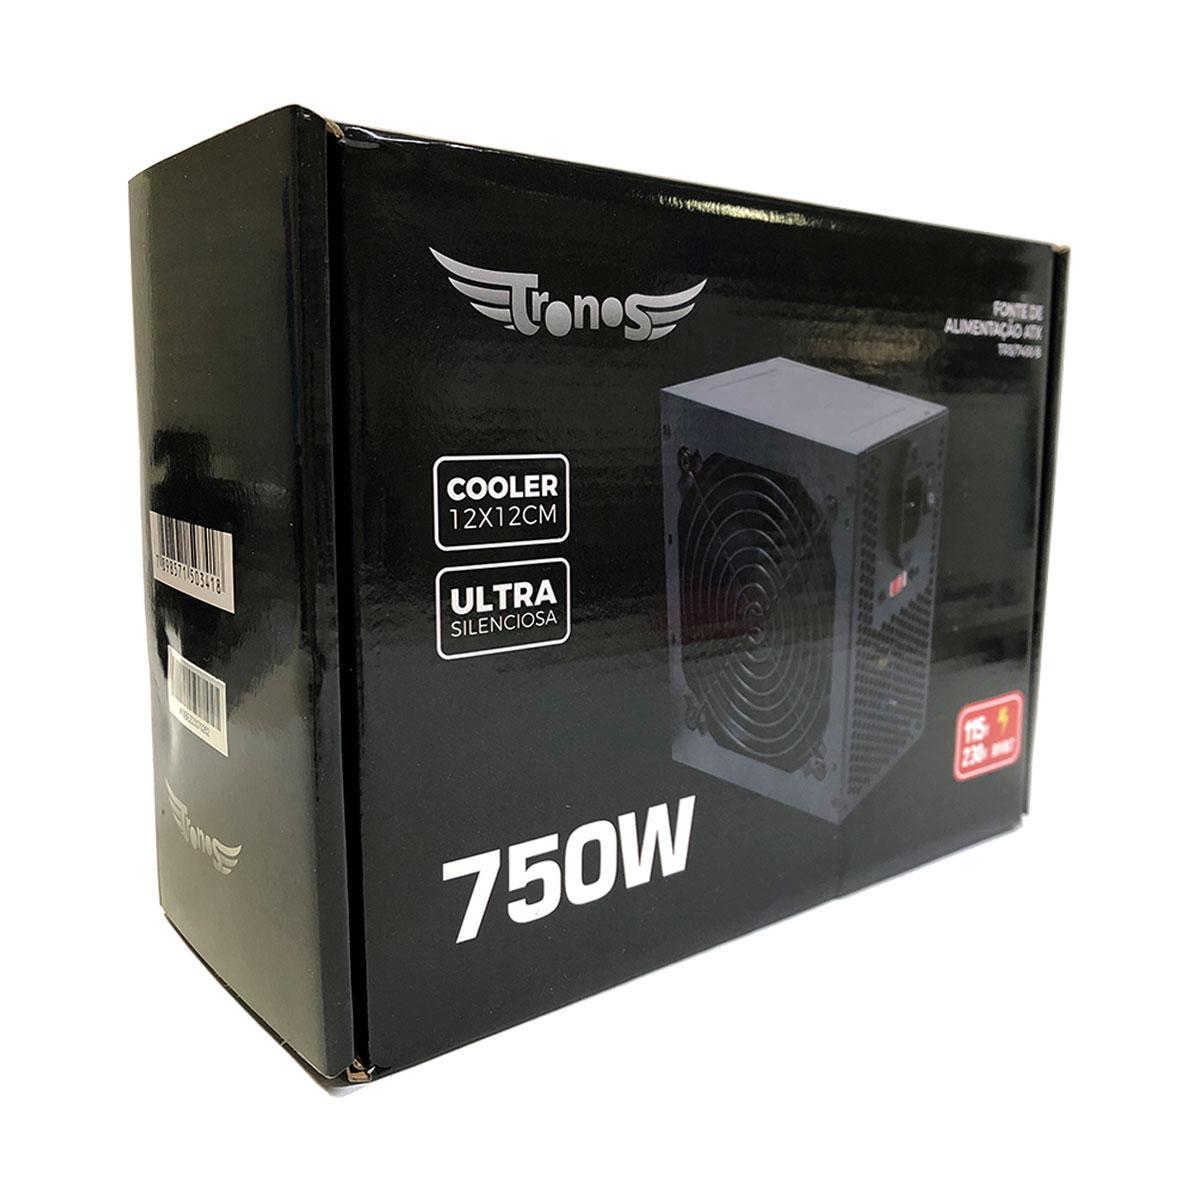 Fonte Gamer ATX Tronos TN/7400-B, 750W, Bivolt, 24 Pinos